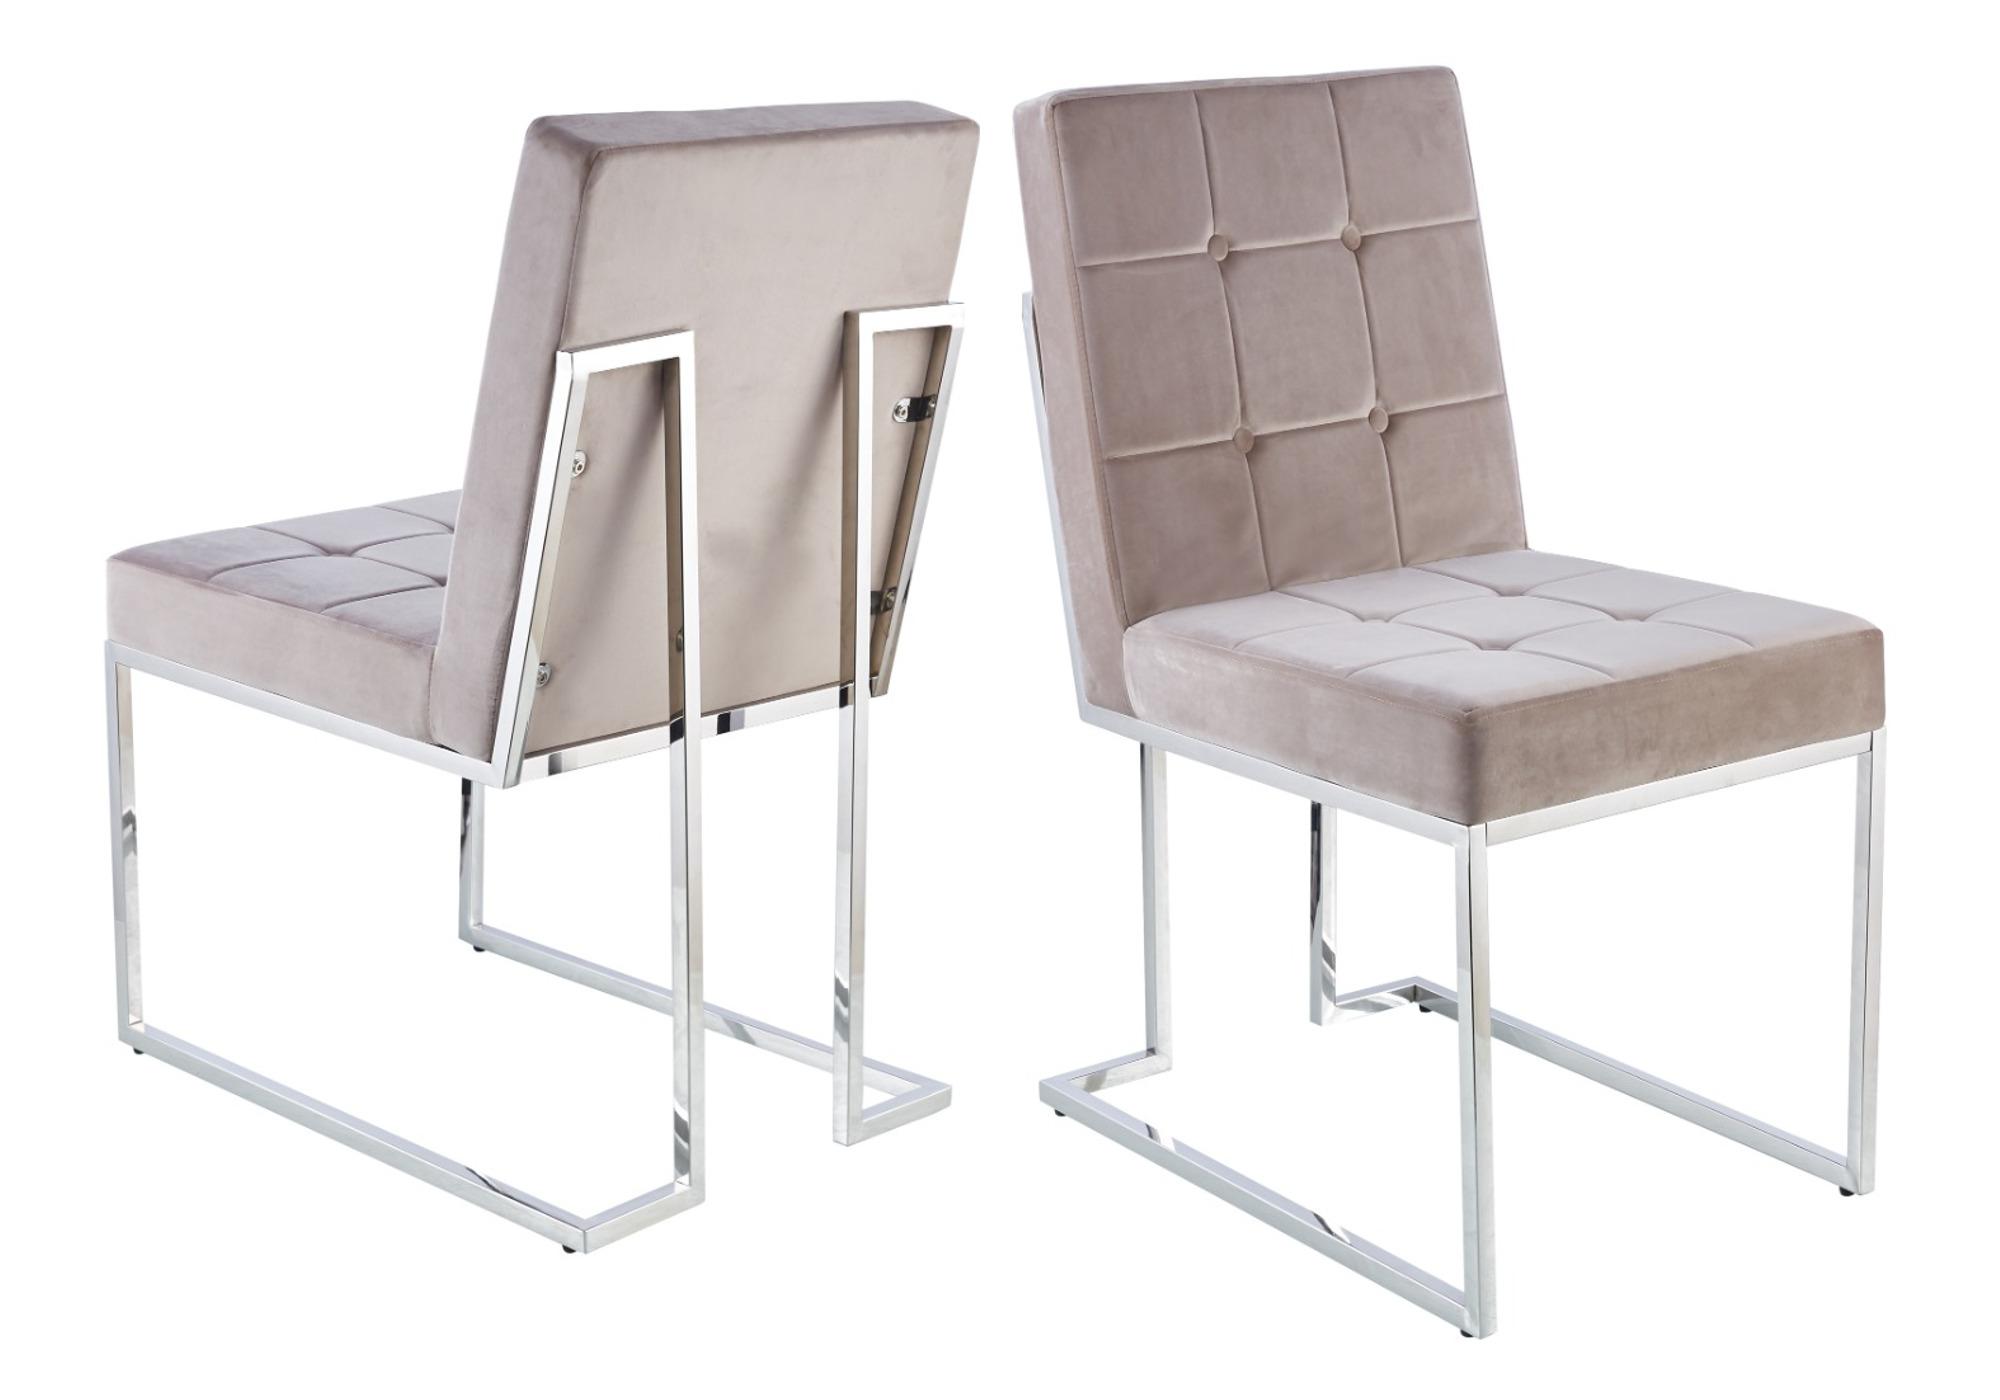 Chaises design capitonné moka RAY